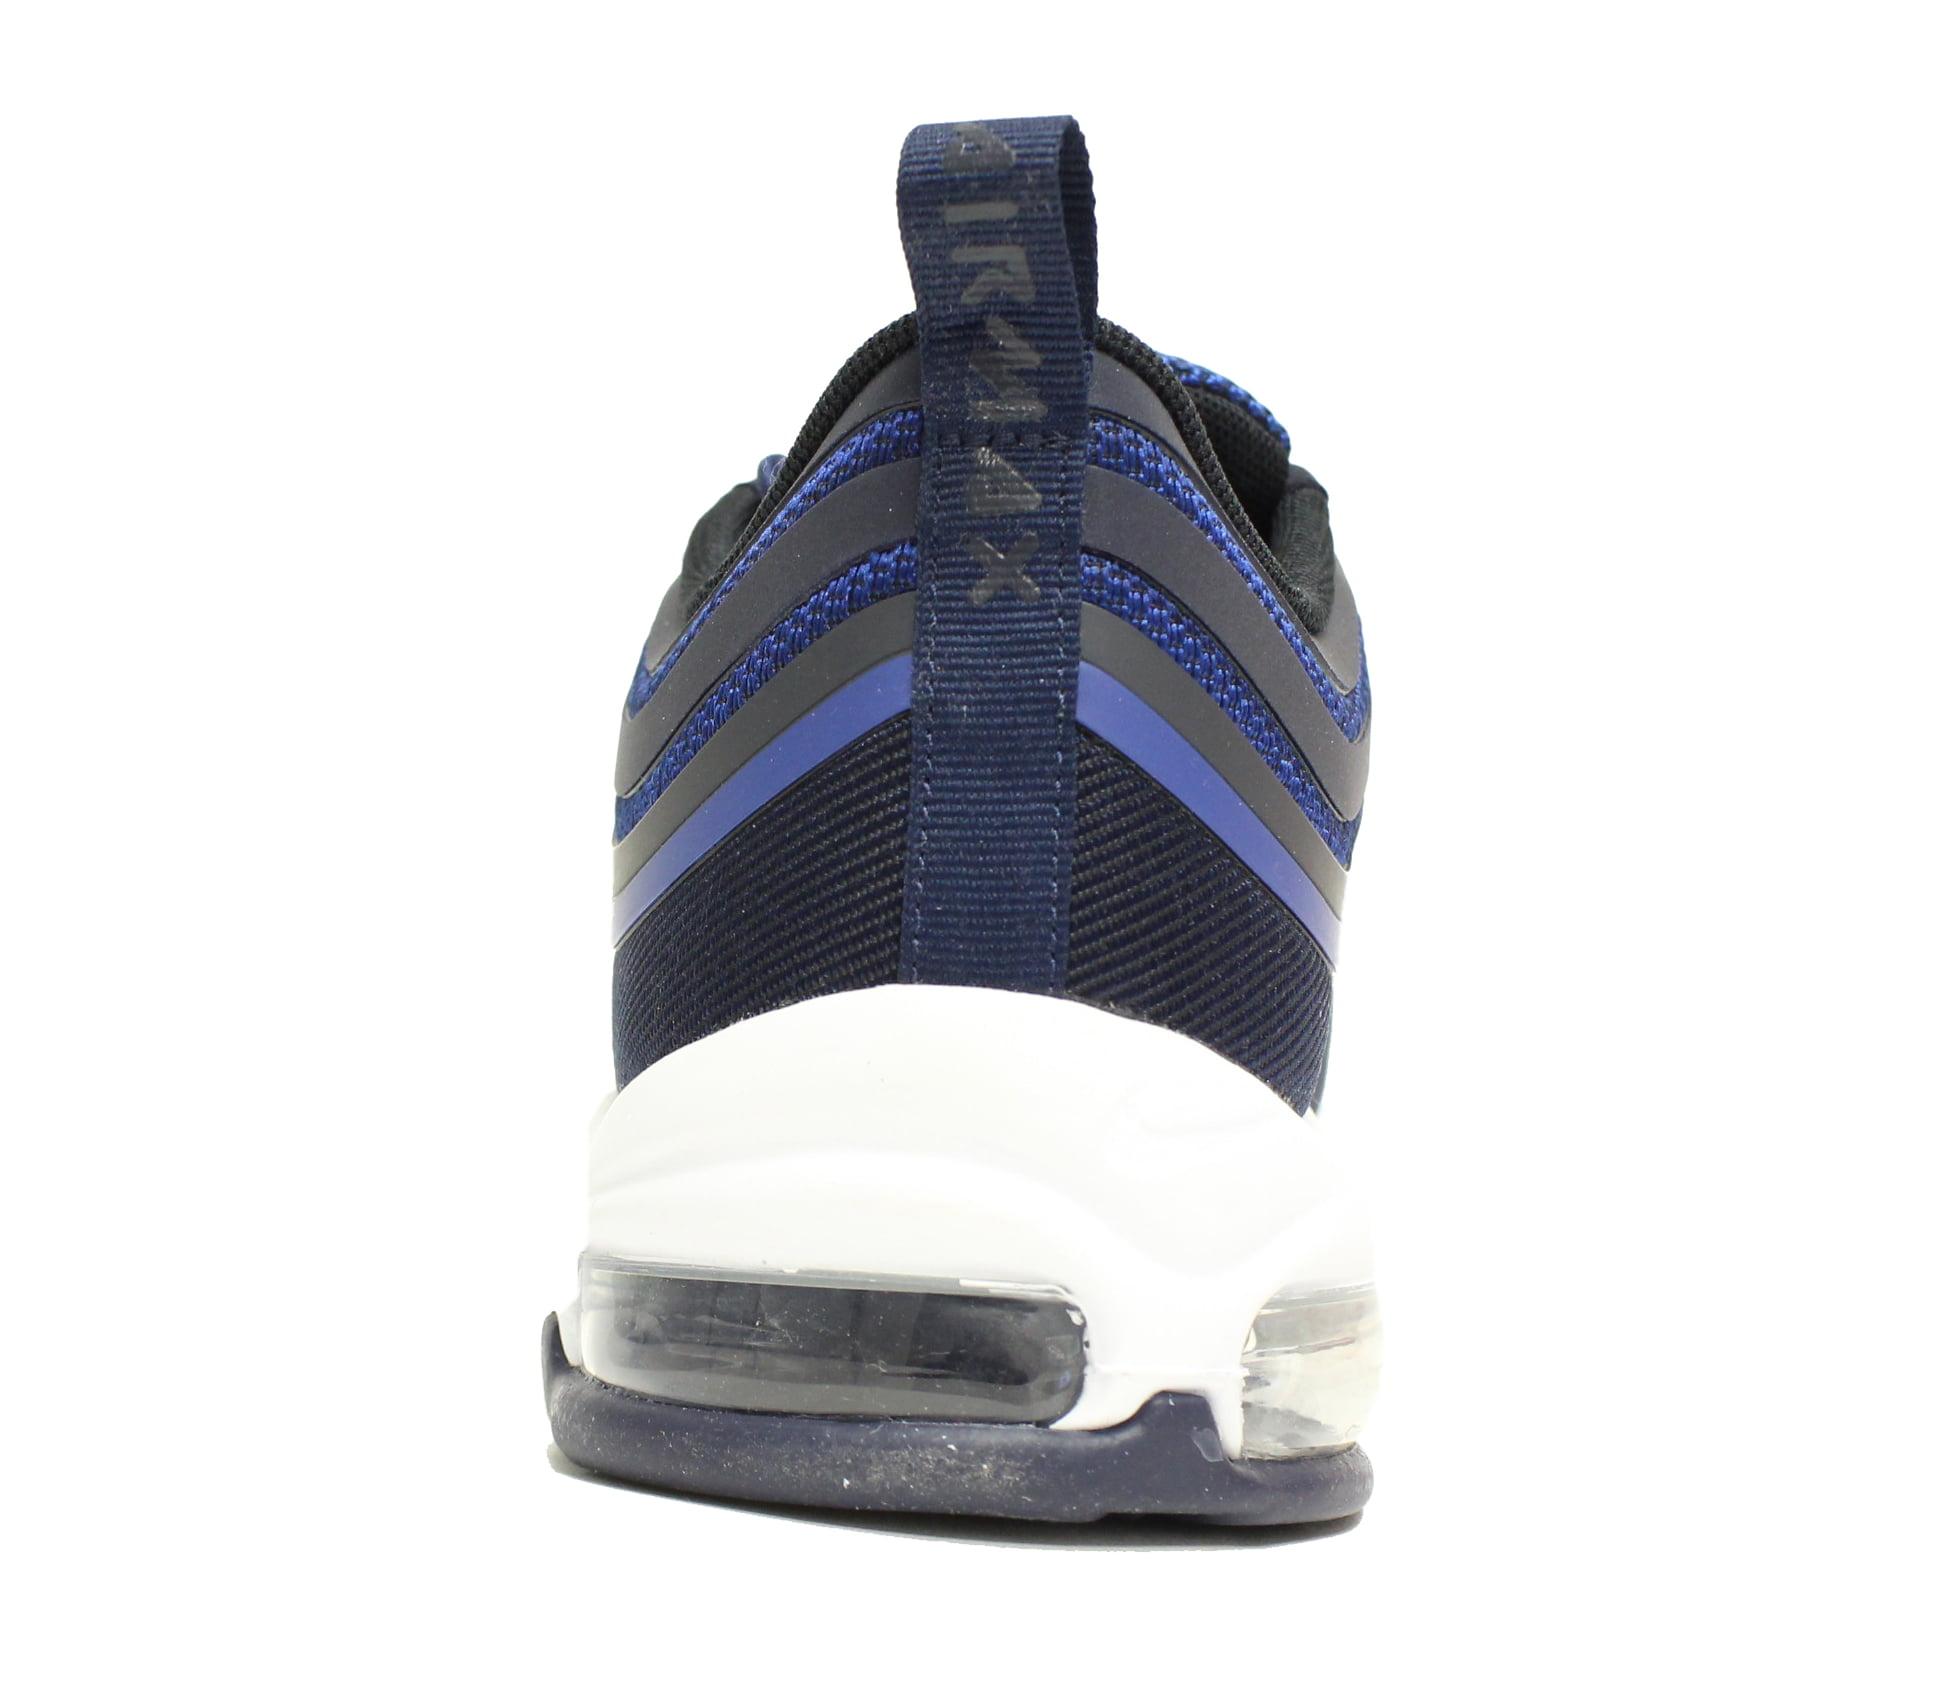 nike air max 97 ultra ul 918356 17 sz 8,5 obsidian 918356 ul bleu marine Blanc ff37a3